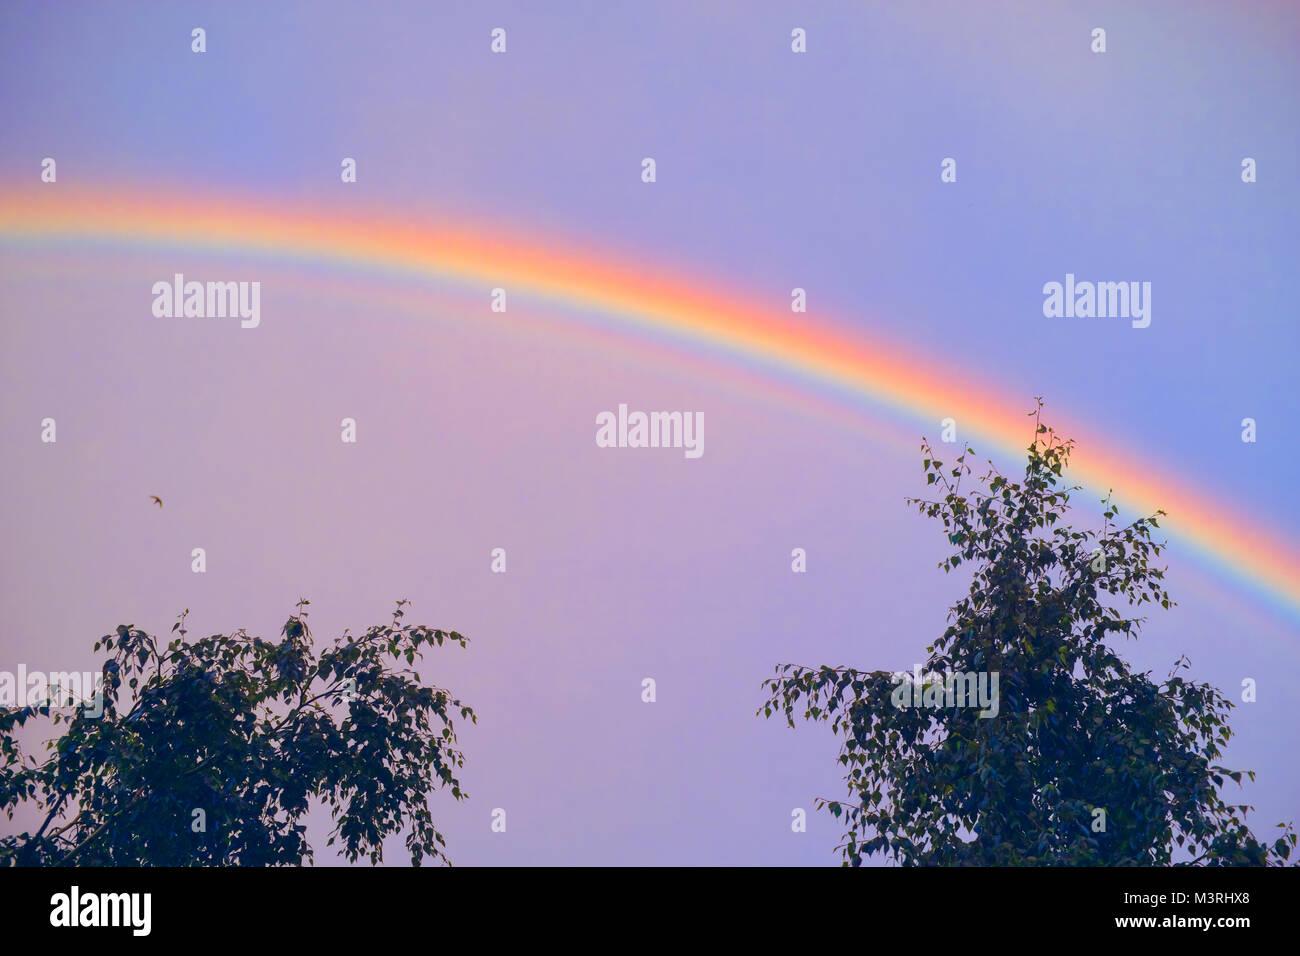 Regenbogen über blauen Himmel. Natürliches Phänomen Stockbild